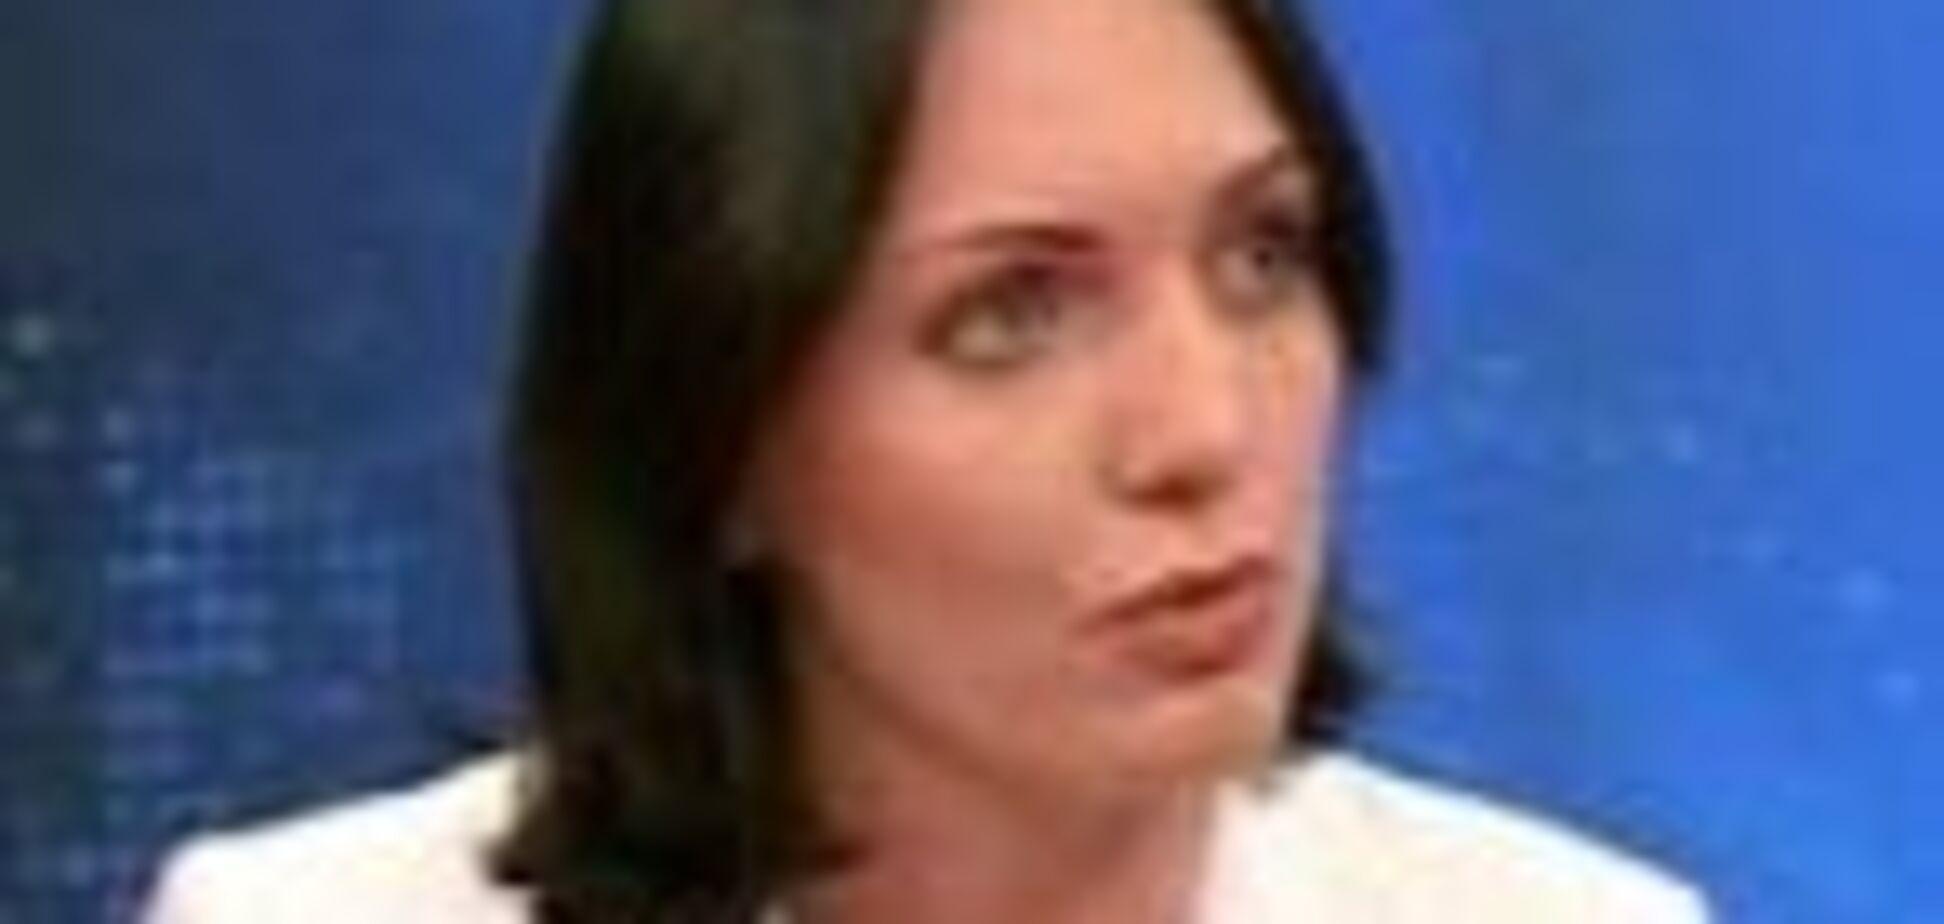 Мирослава Гонгадзе: 'Україна - дивна країна: один президент вбиває, інший - нагороджує'